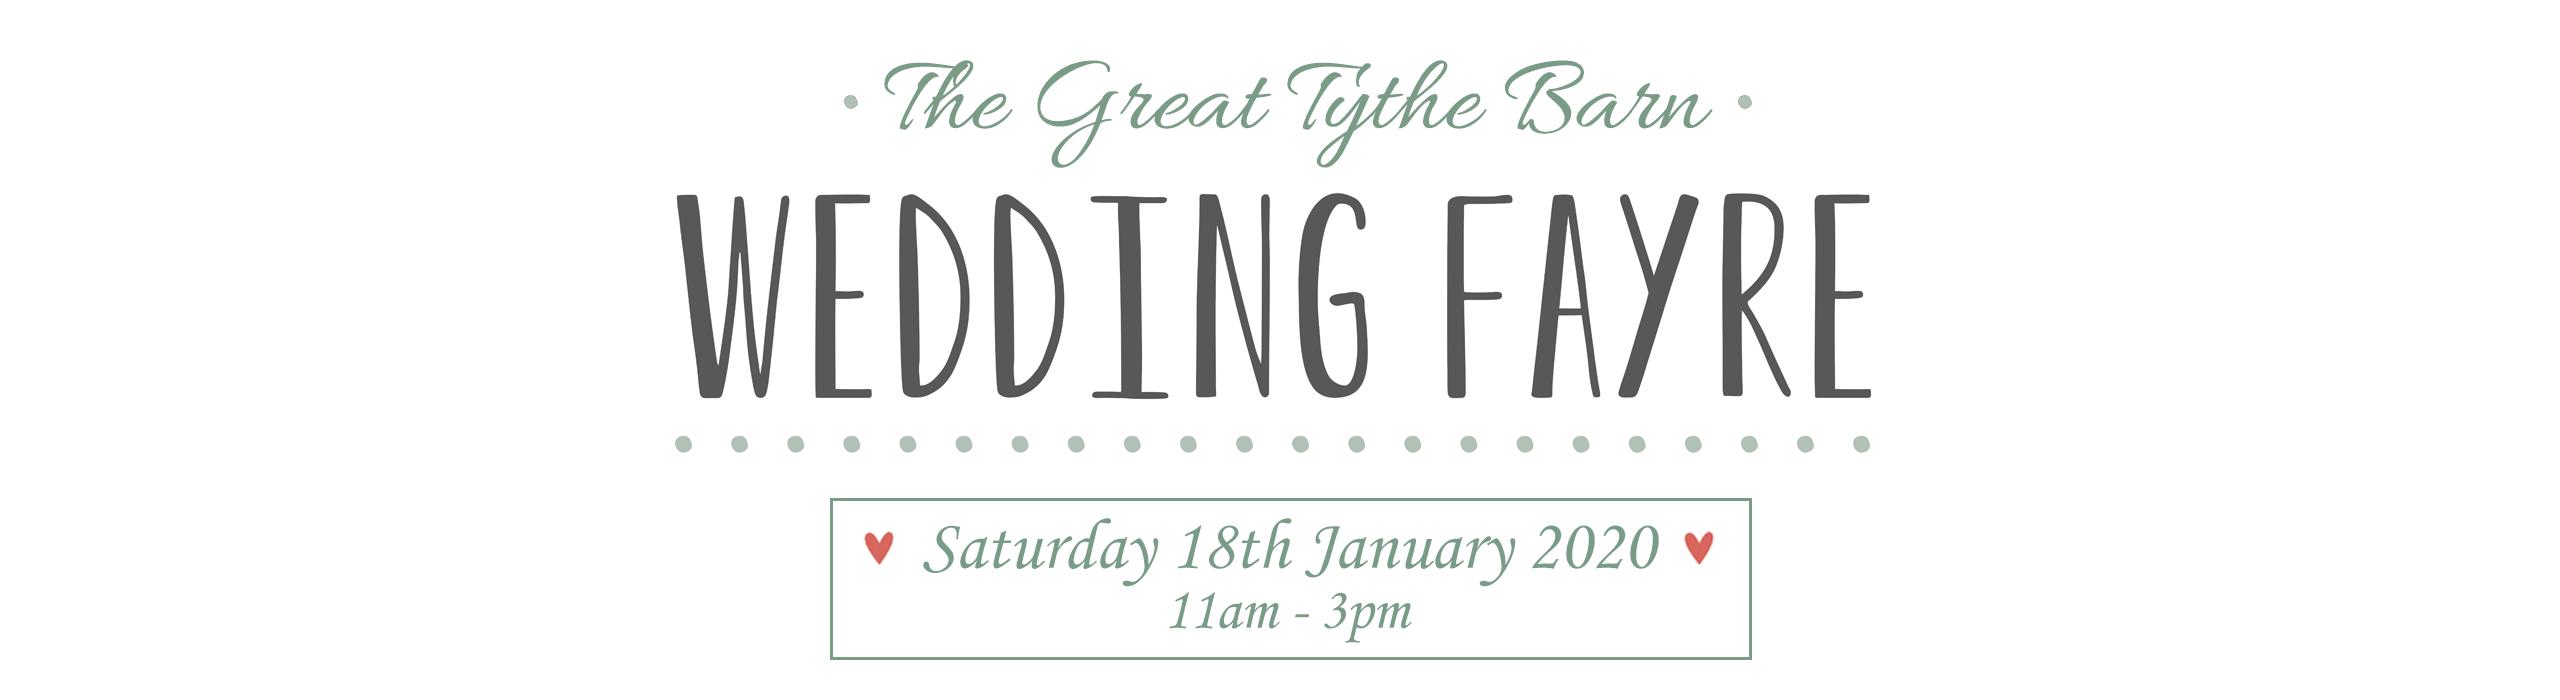 The Great Tythe Barn Wedding Fayre 2020